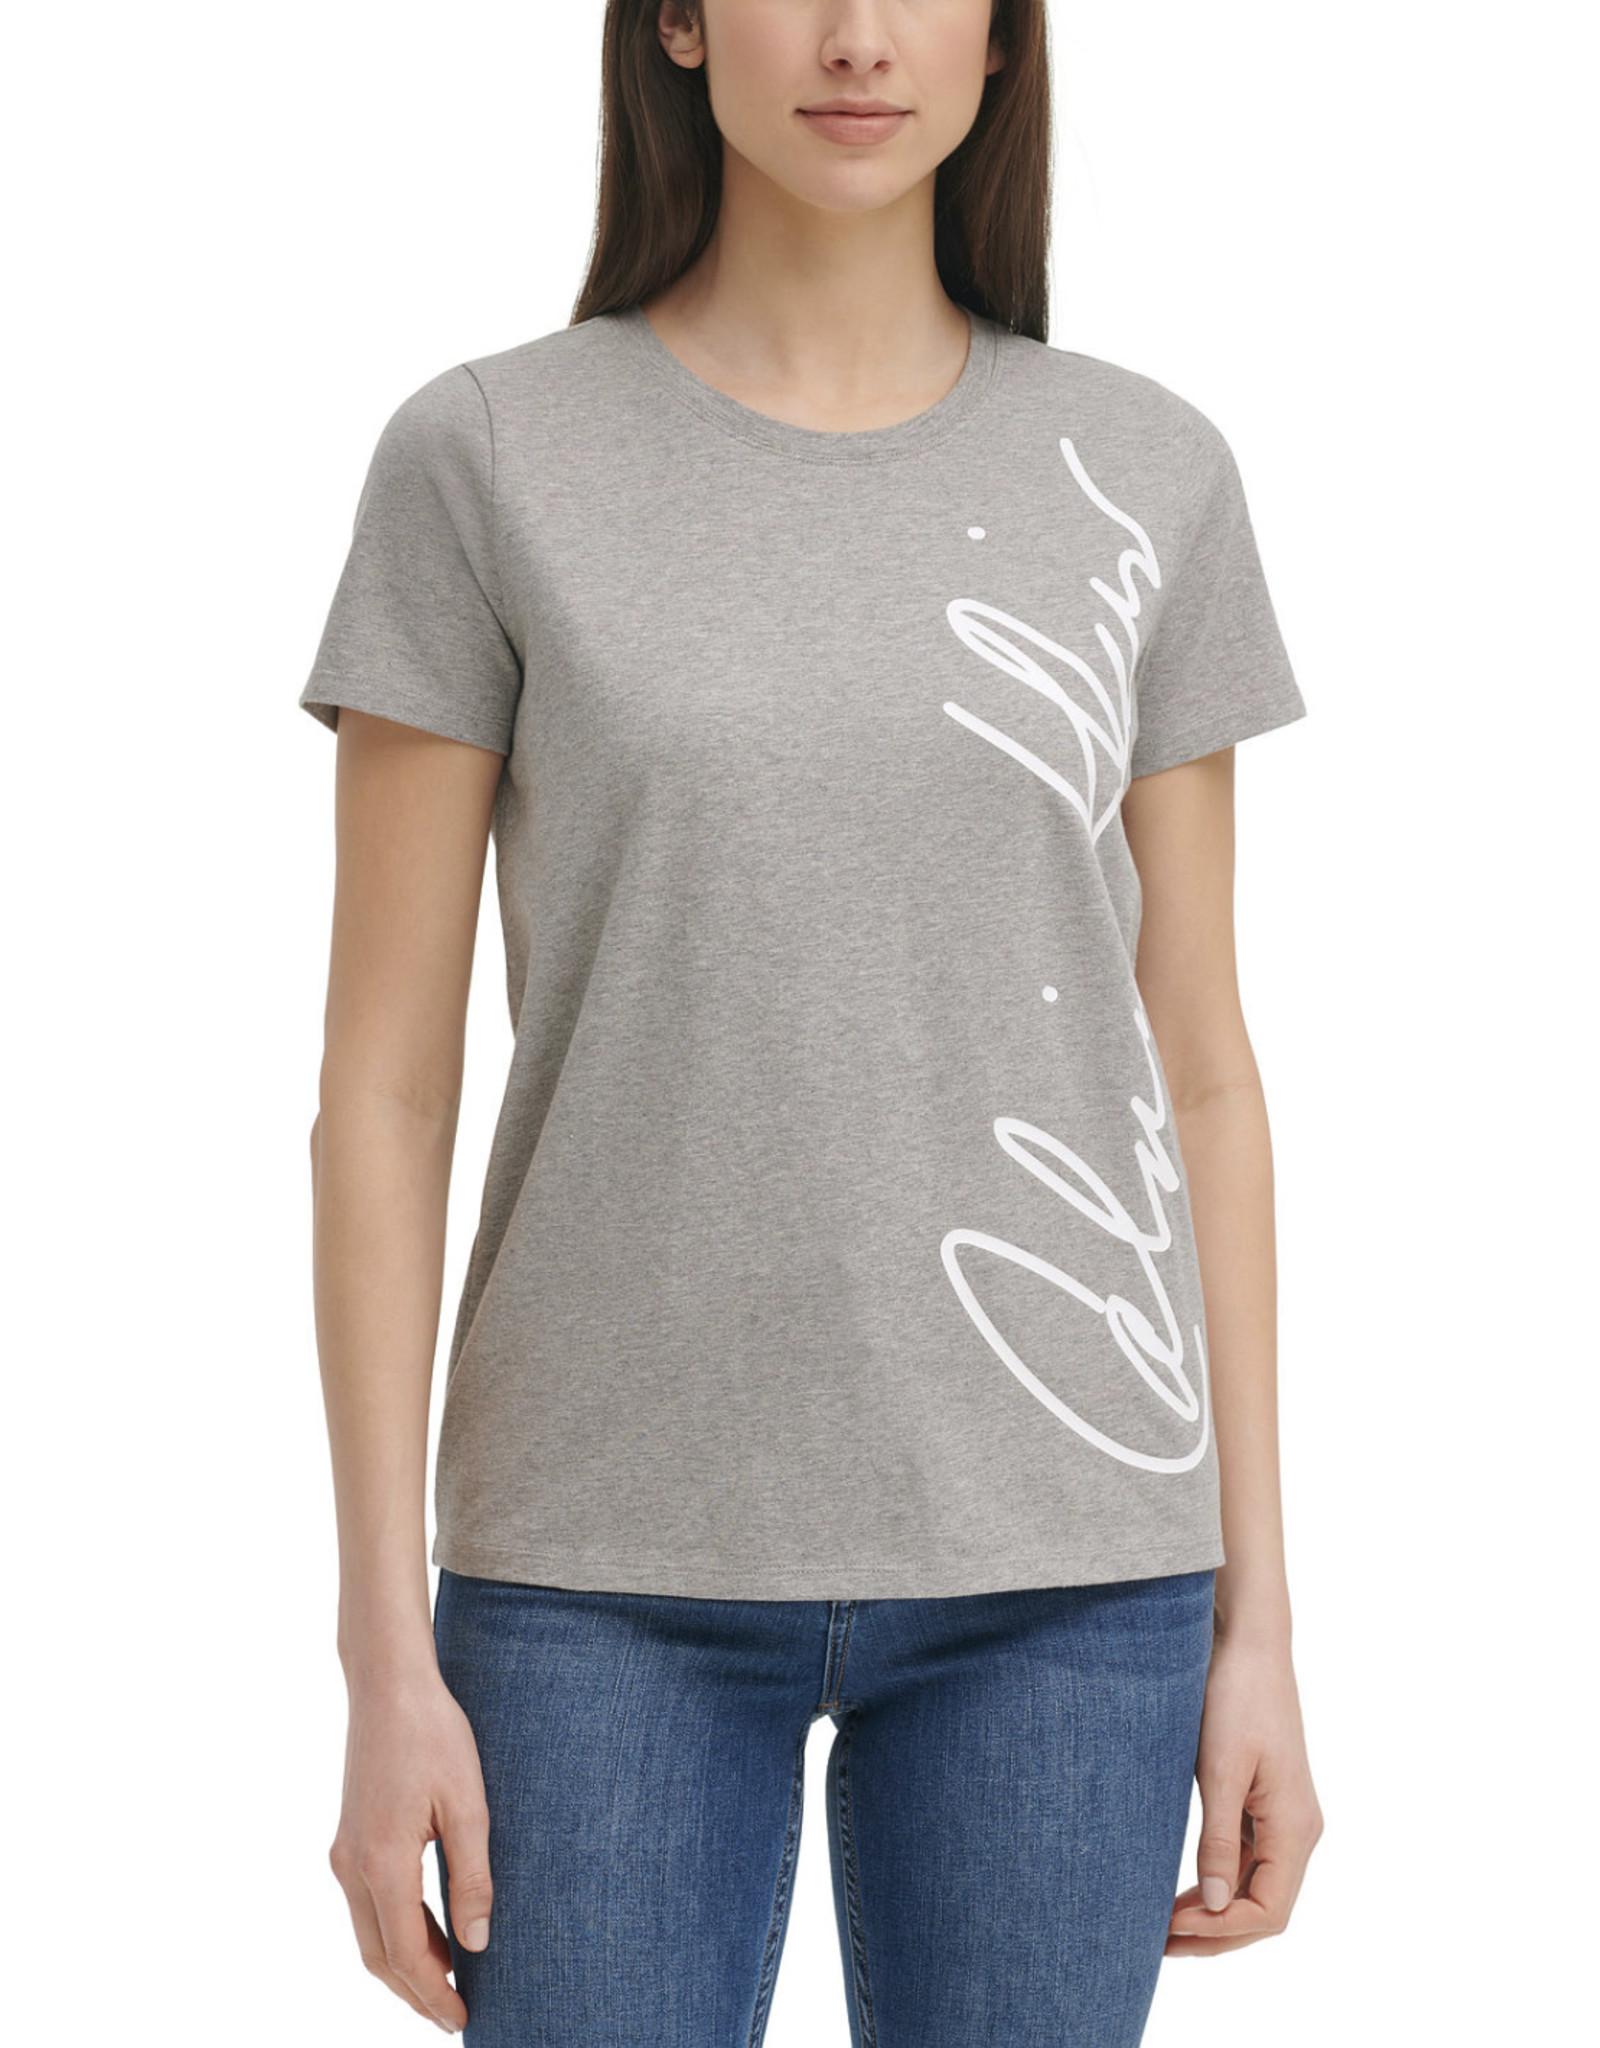 Calvin Klein Calvin Klein Logo Print T-Shirt